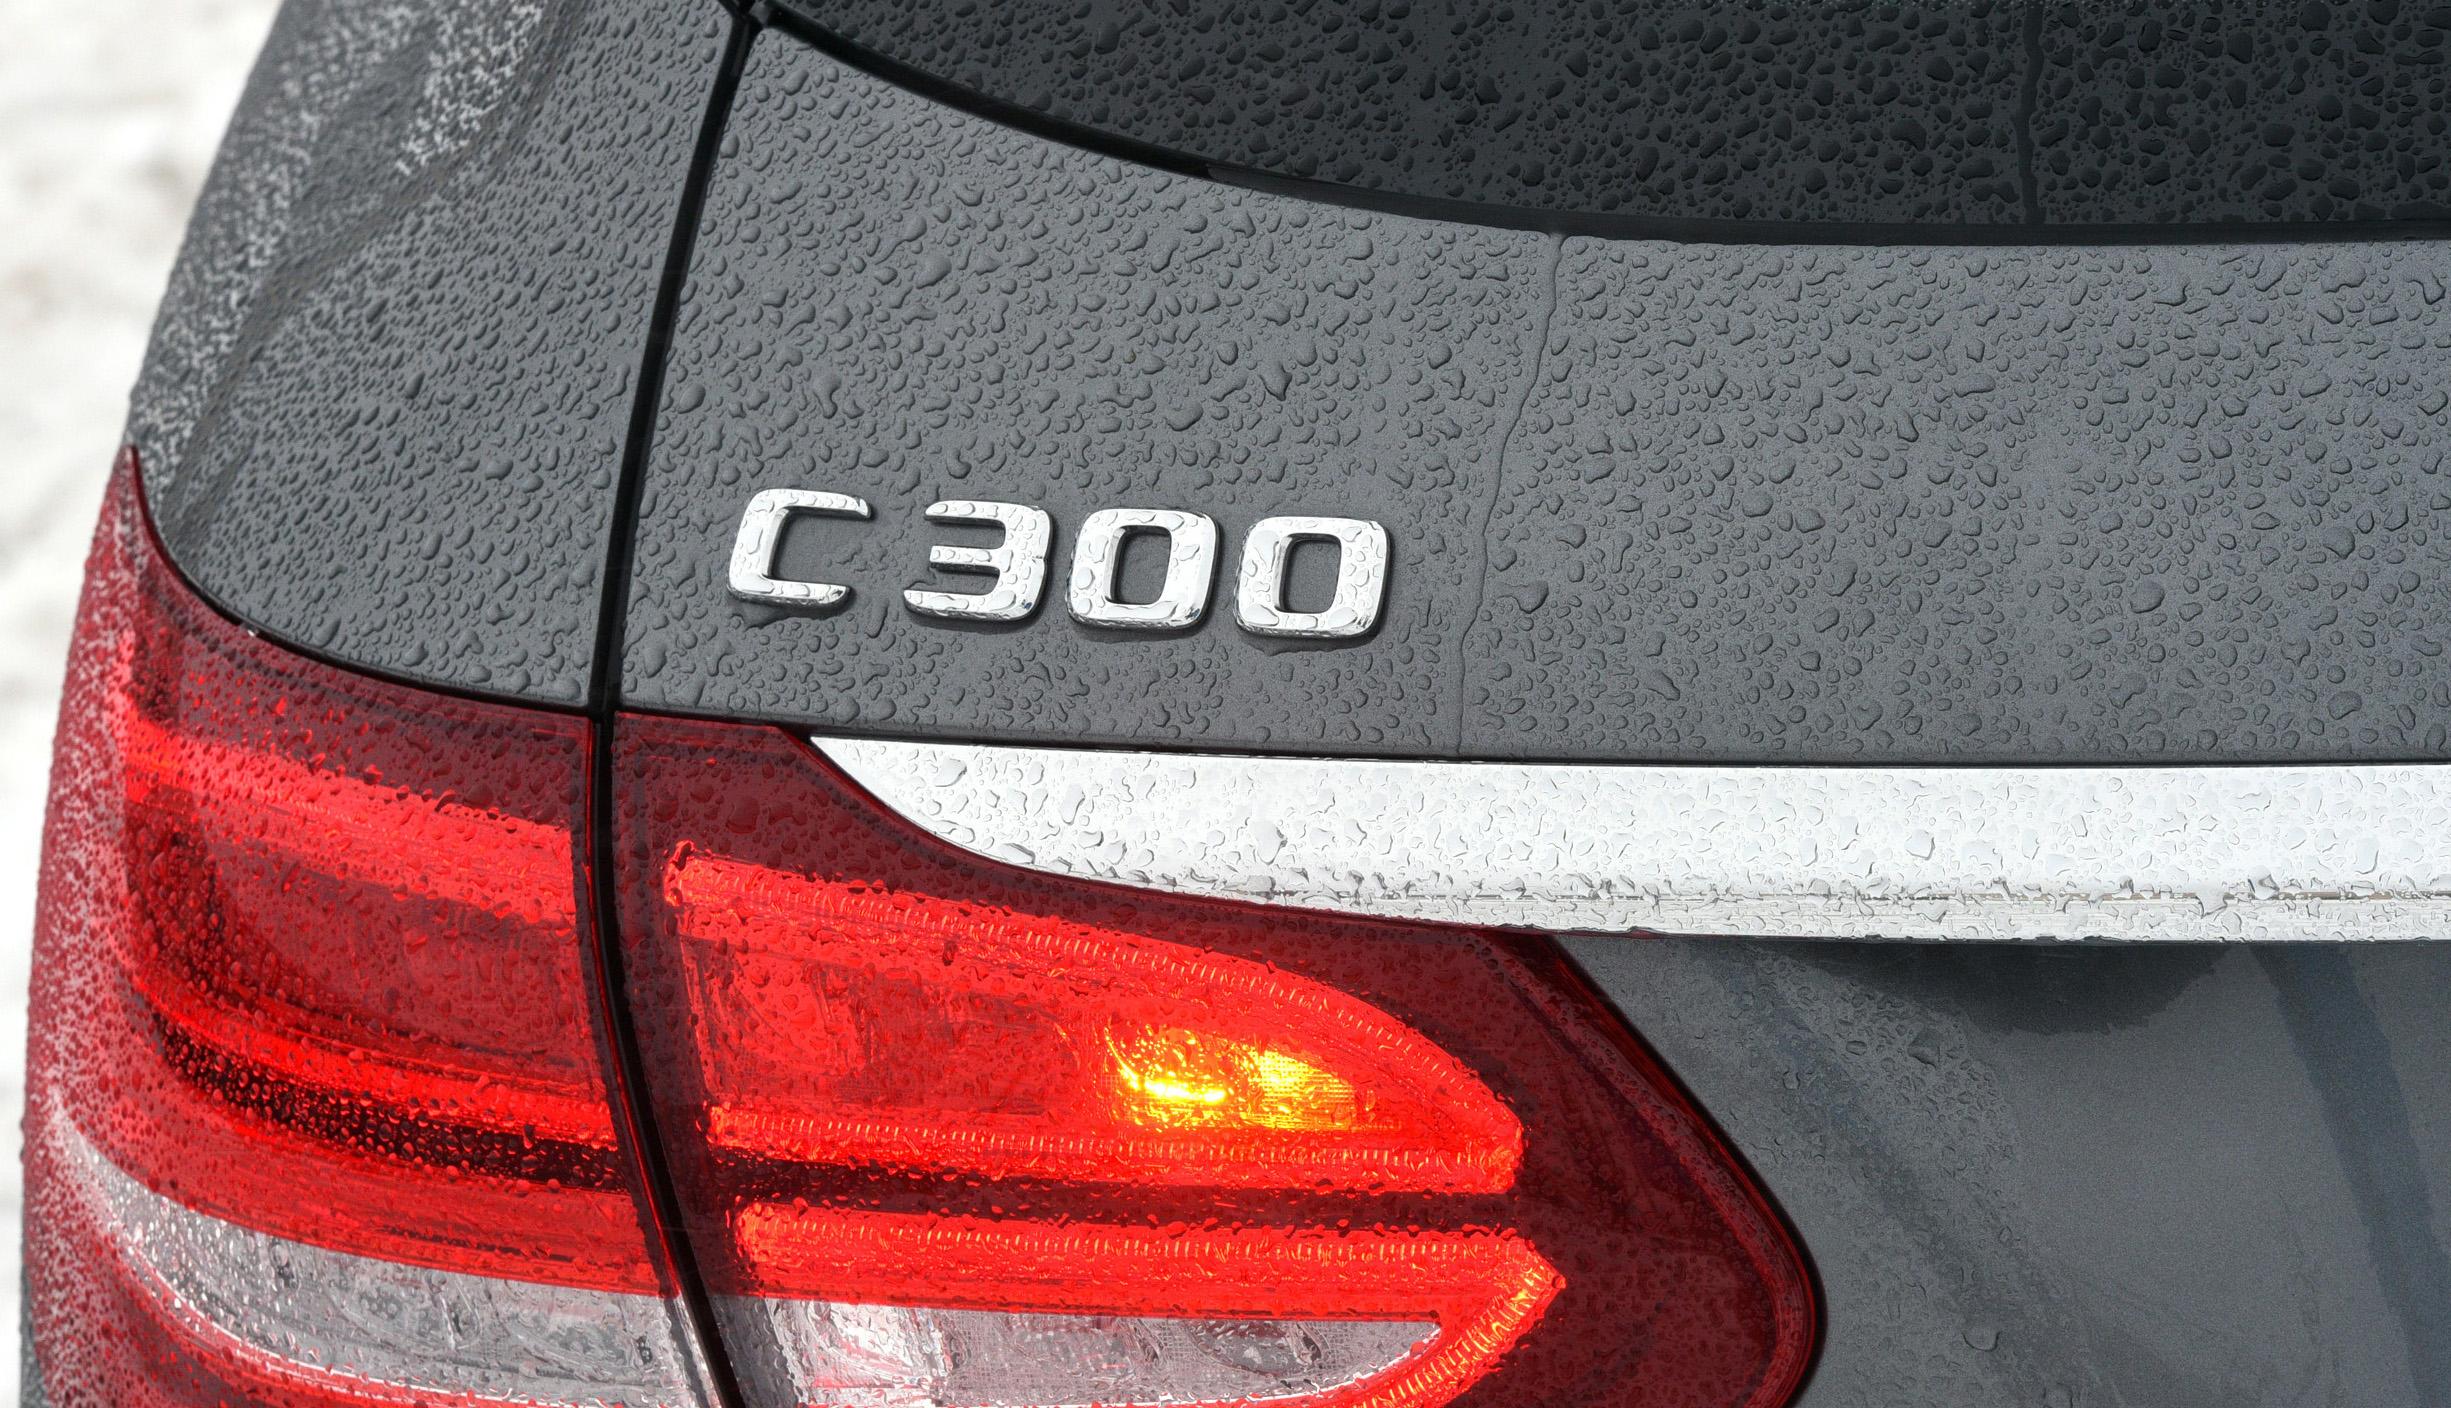 2018 Mercedes-Benz C 300 4Matic Wagon review